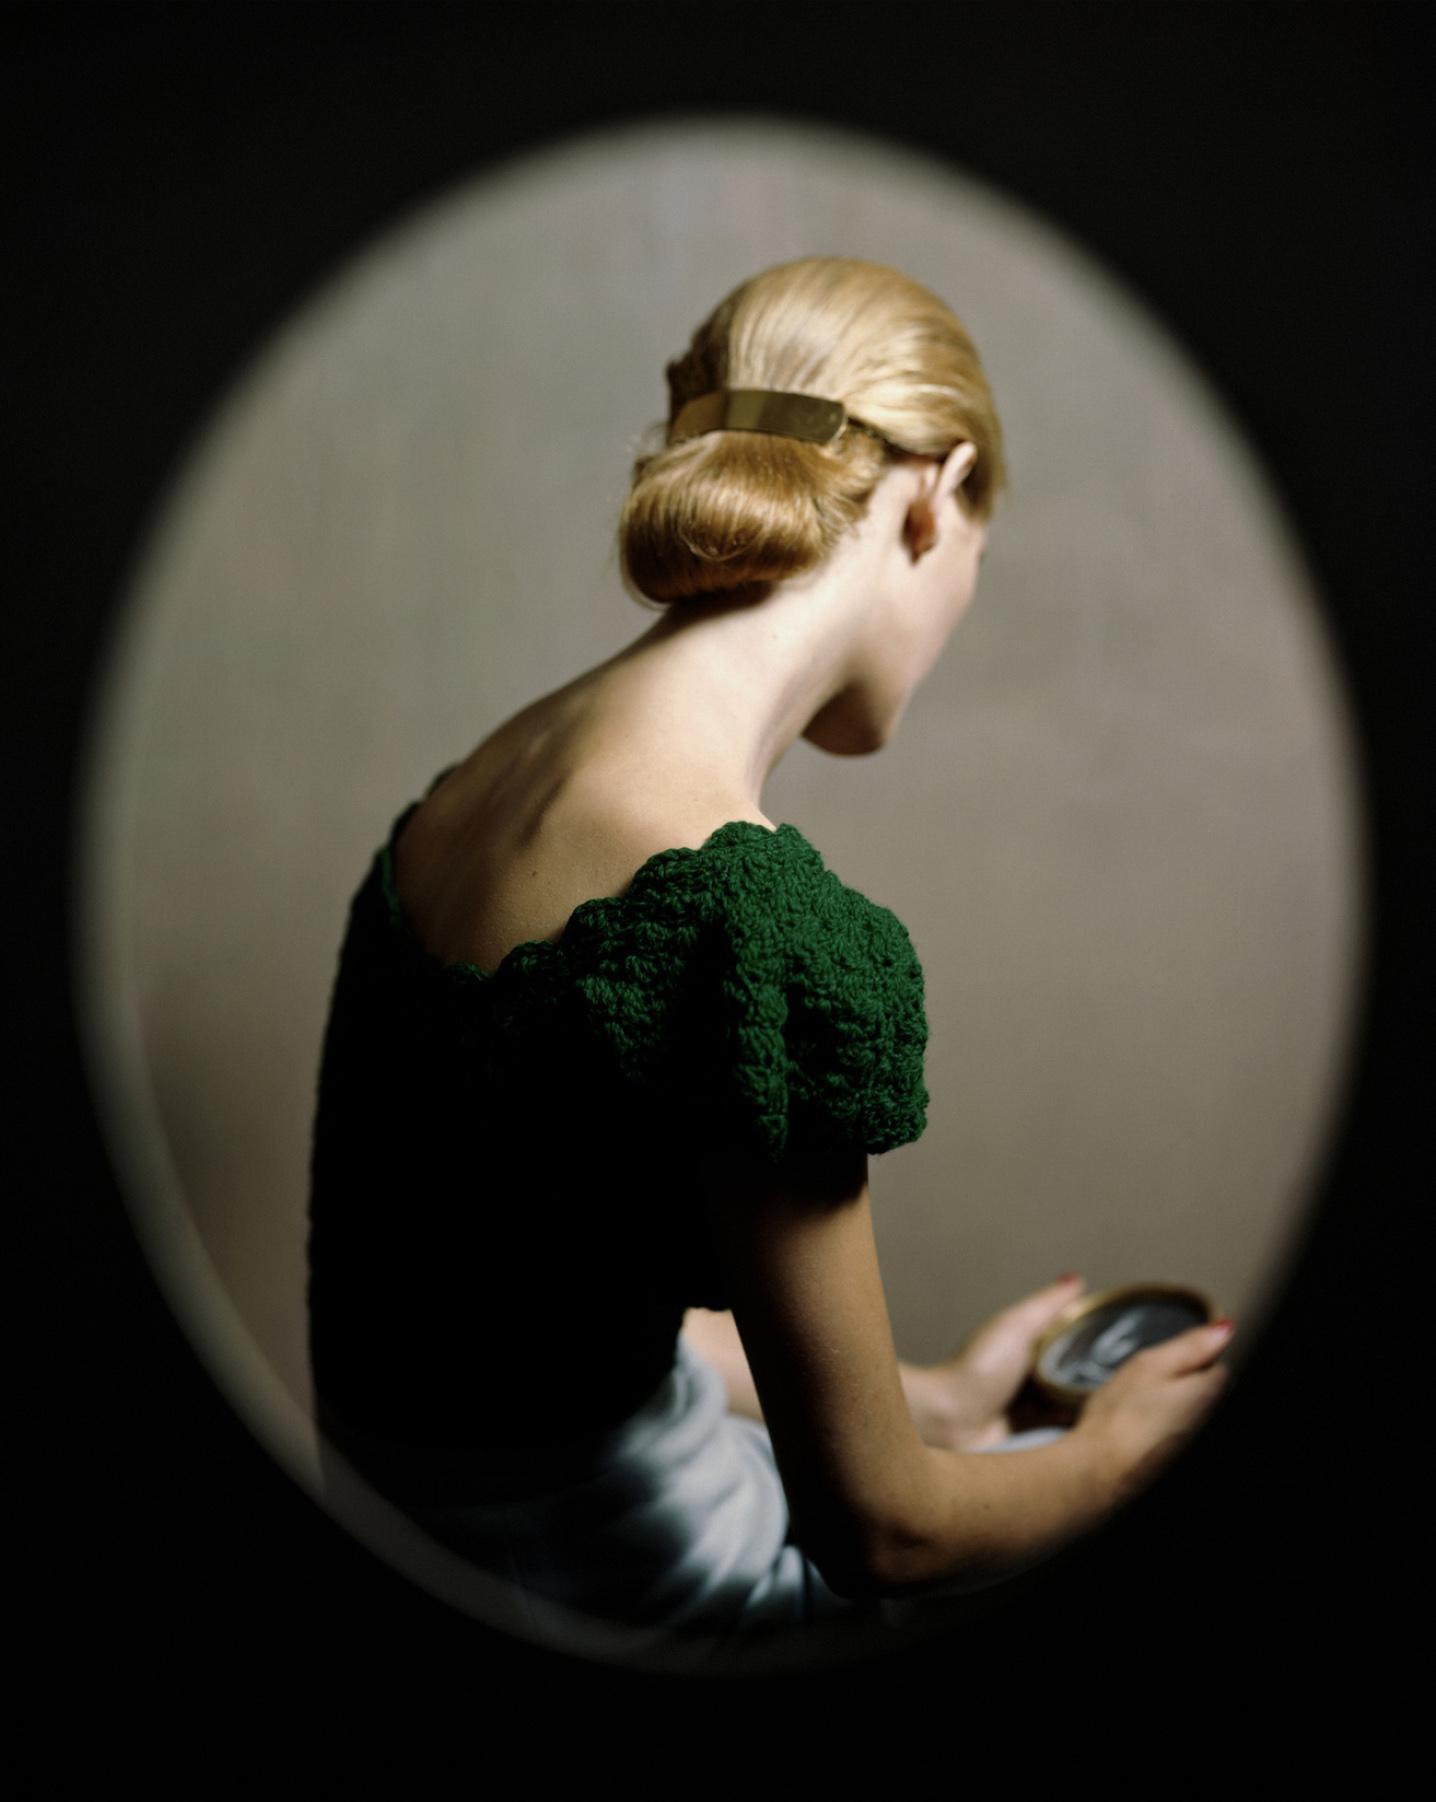 luciano lapadula moda fotografia Frances McLaughlin-Gill photography fashion blog vogue 40s wwii